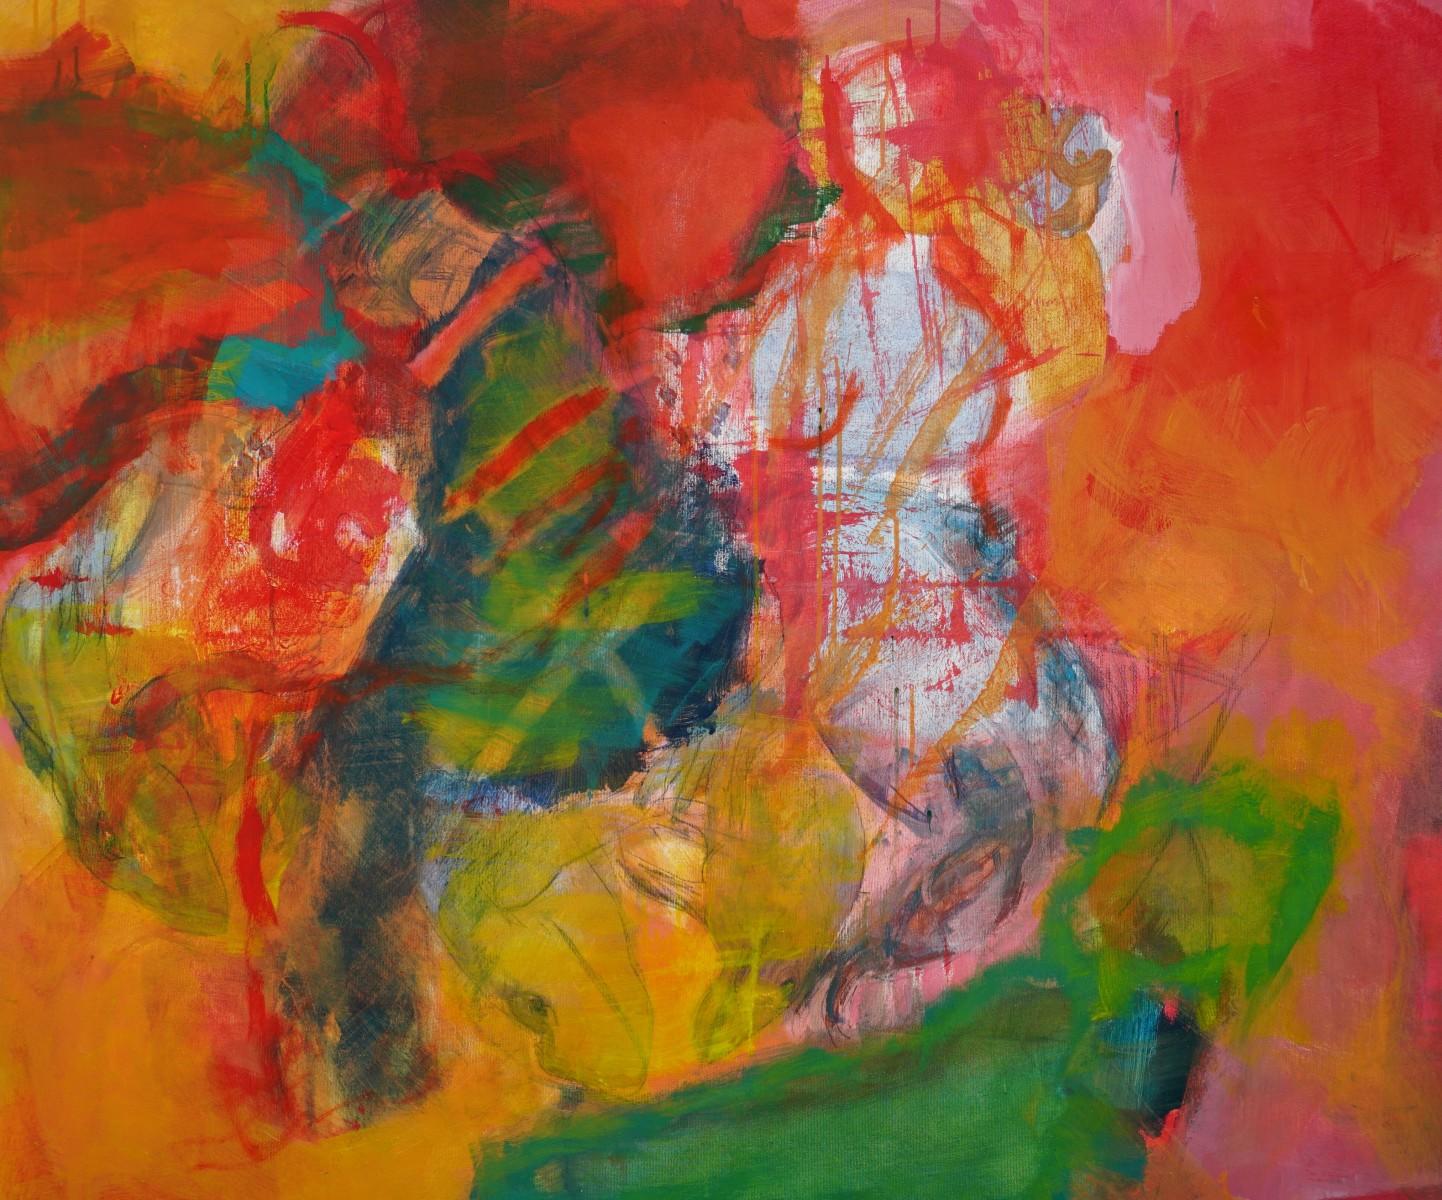 Das-Theaterstück, Acryl, 100x80cm, 2020